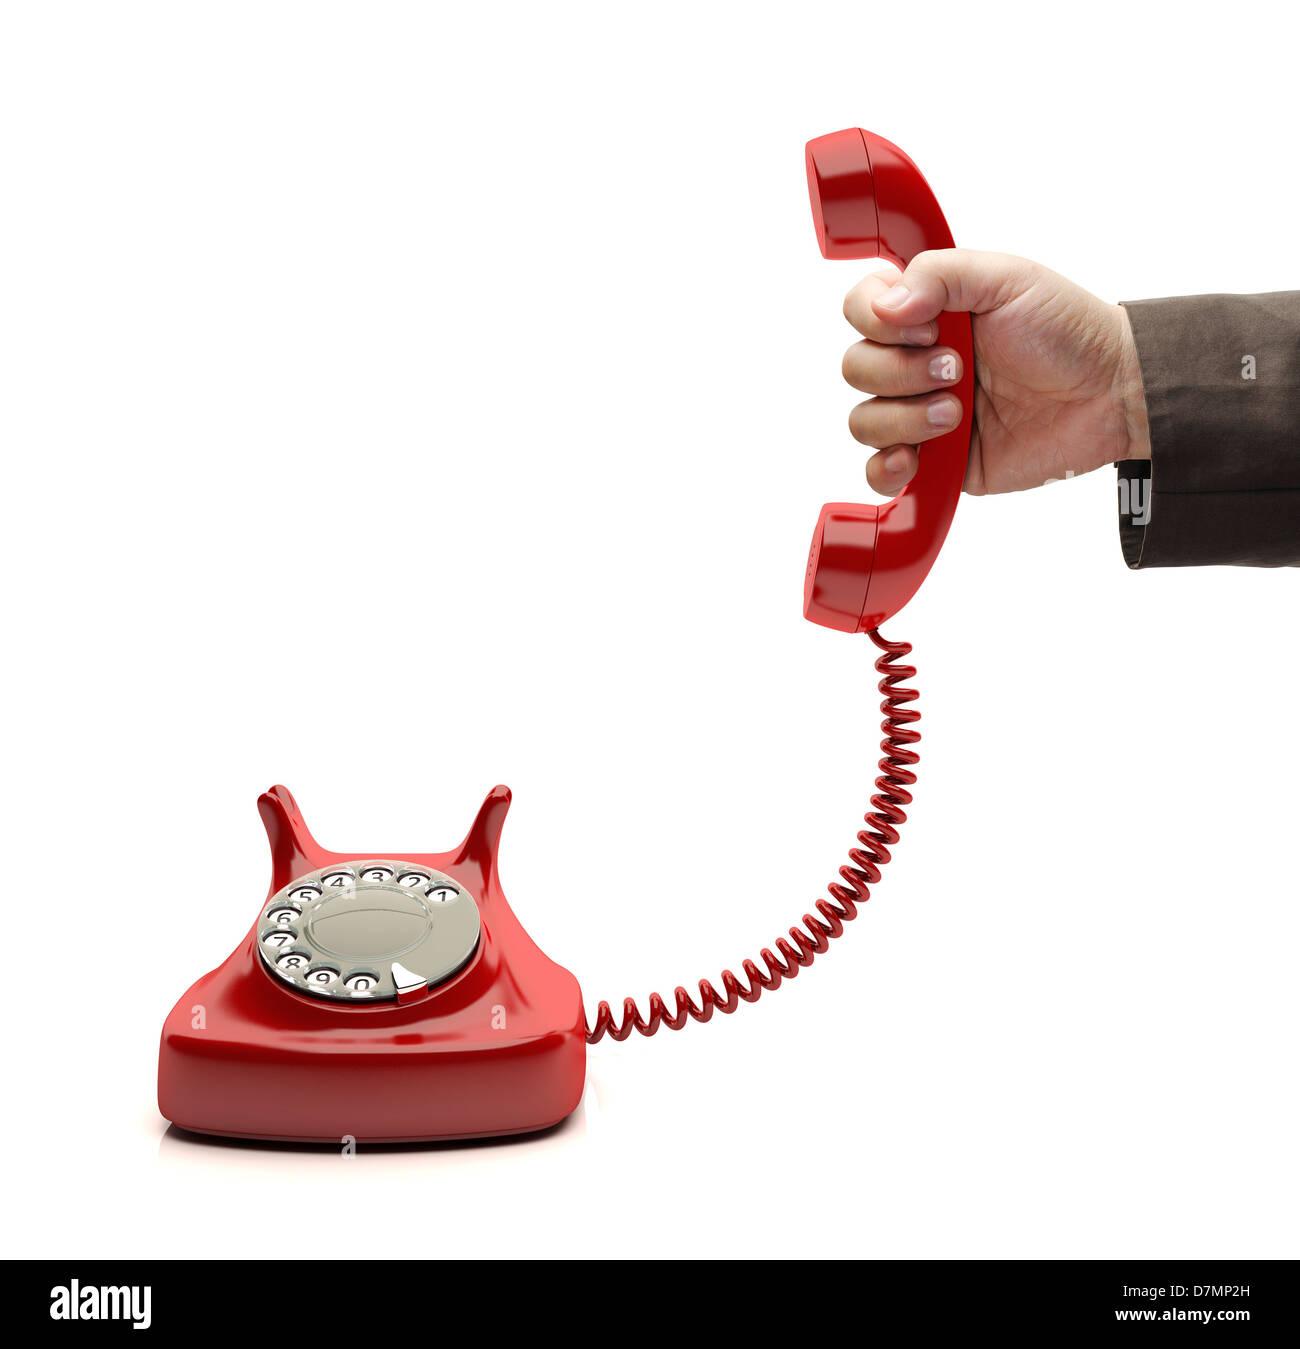 Telephone call - Stock Image